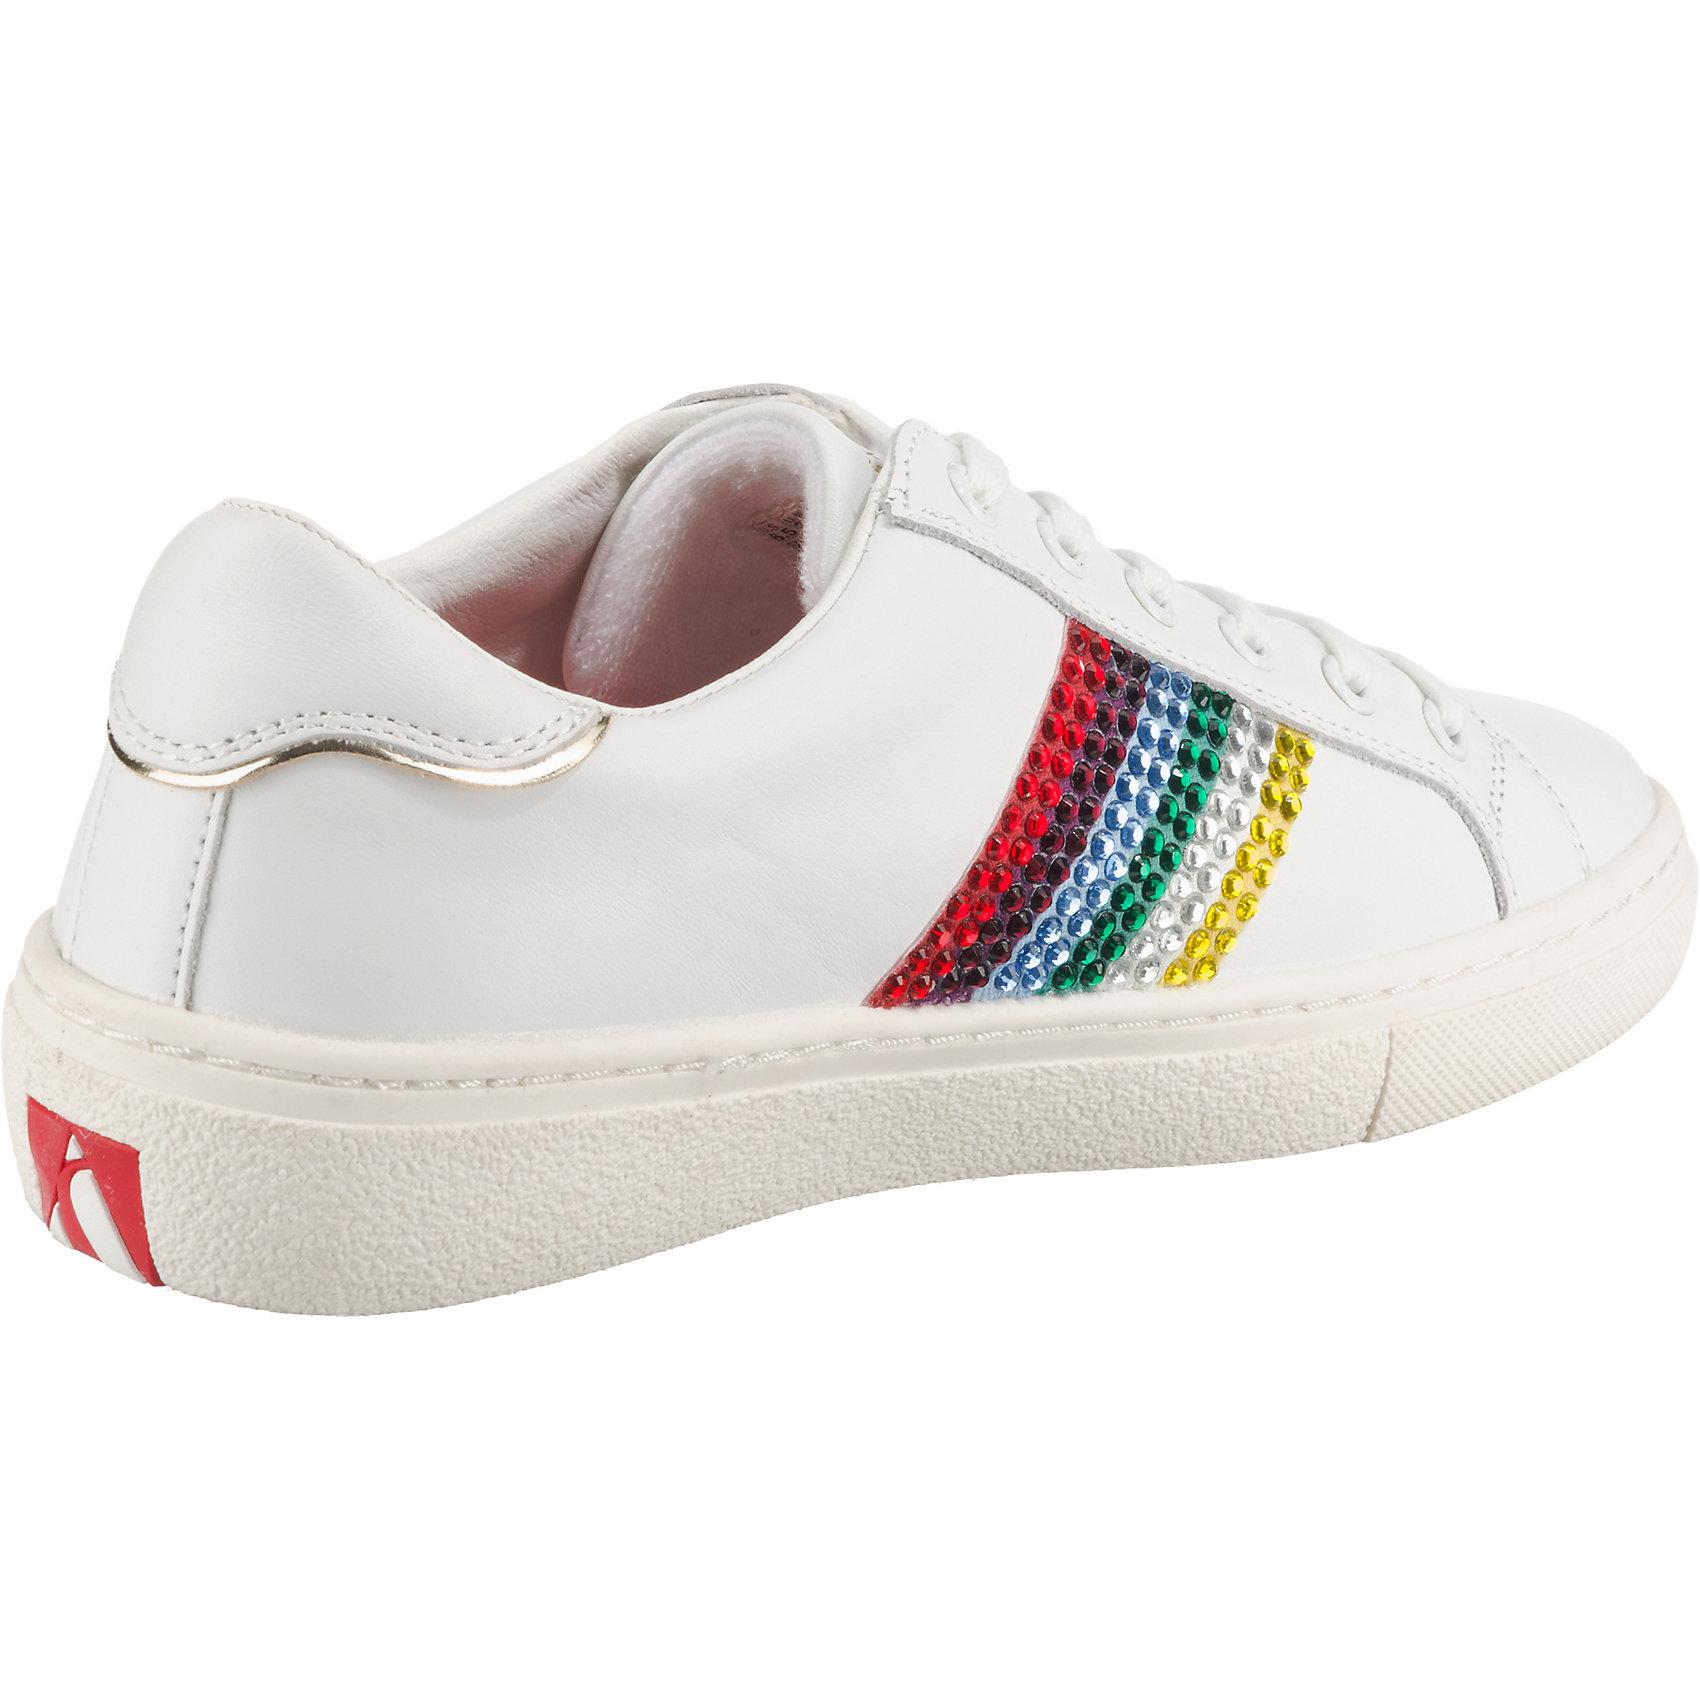 Neu SKECHERS GOLDIERAINBOW ROCKERS für Sneakers Niedrig 10412191 für ROCKERS Damen bcb6ba